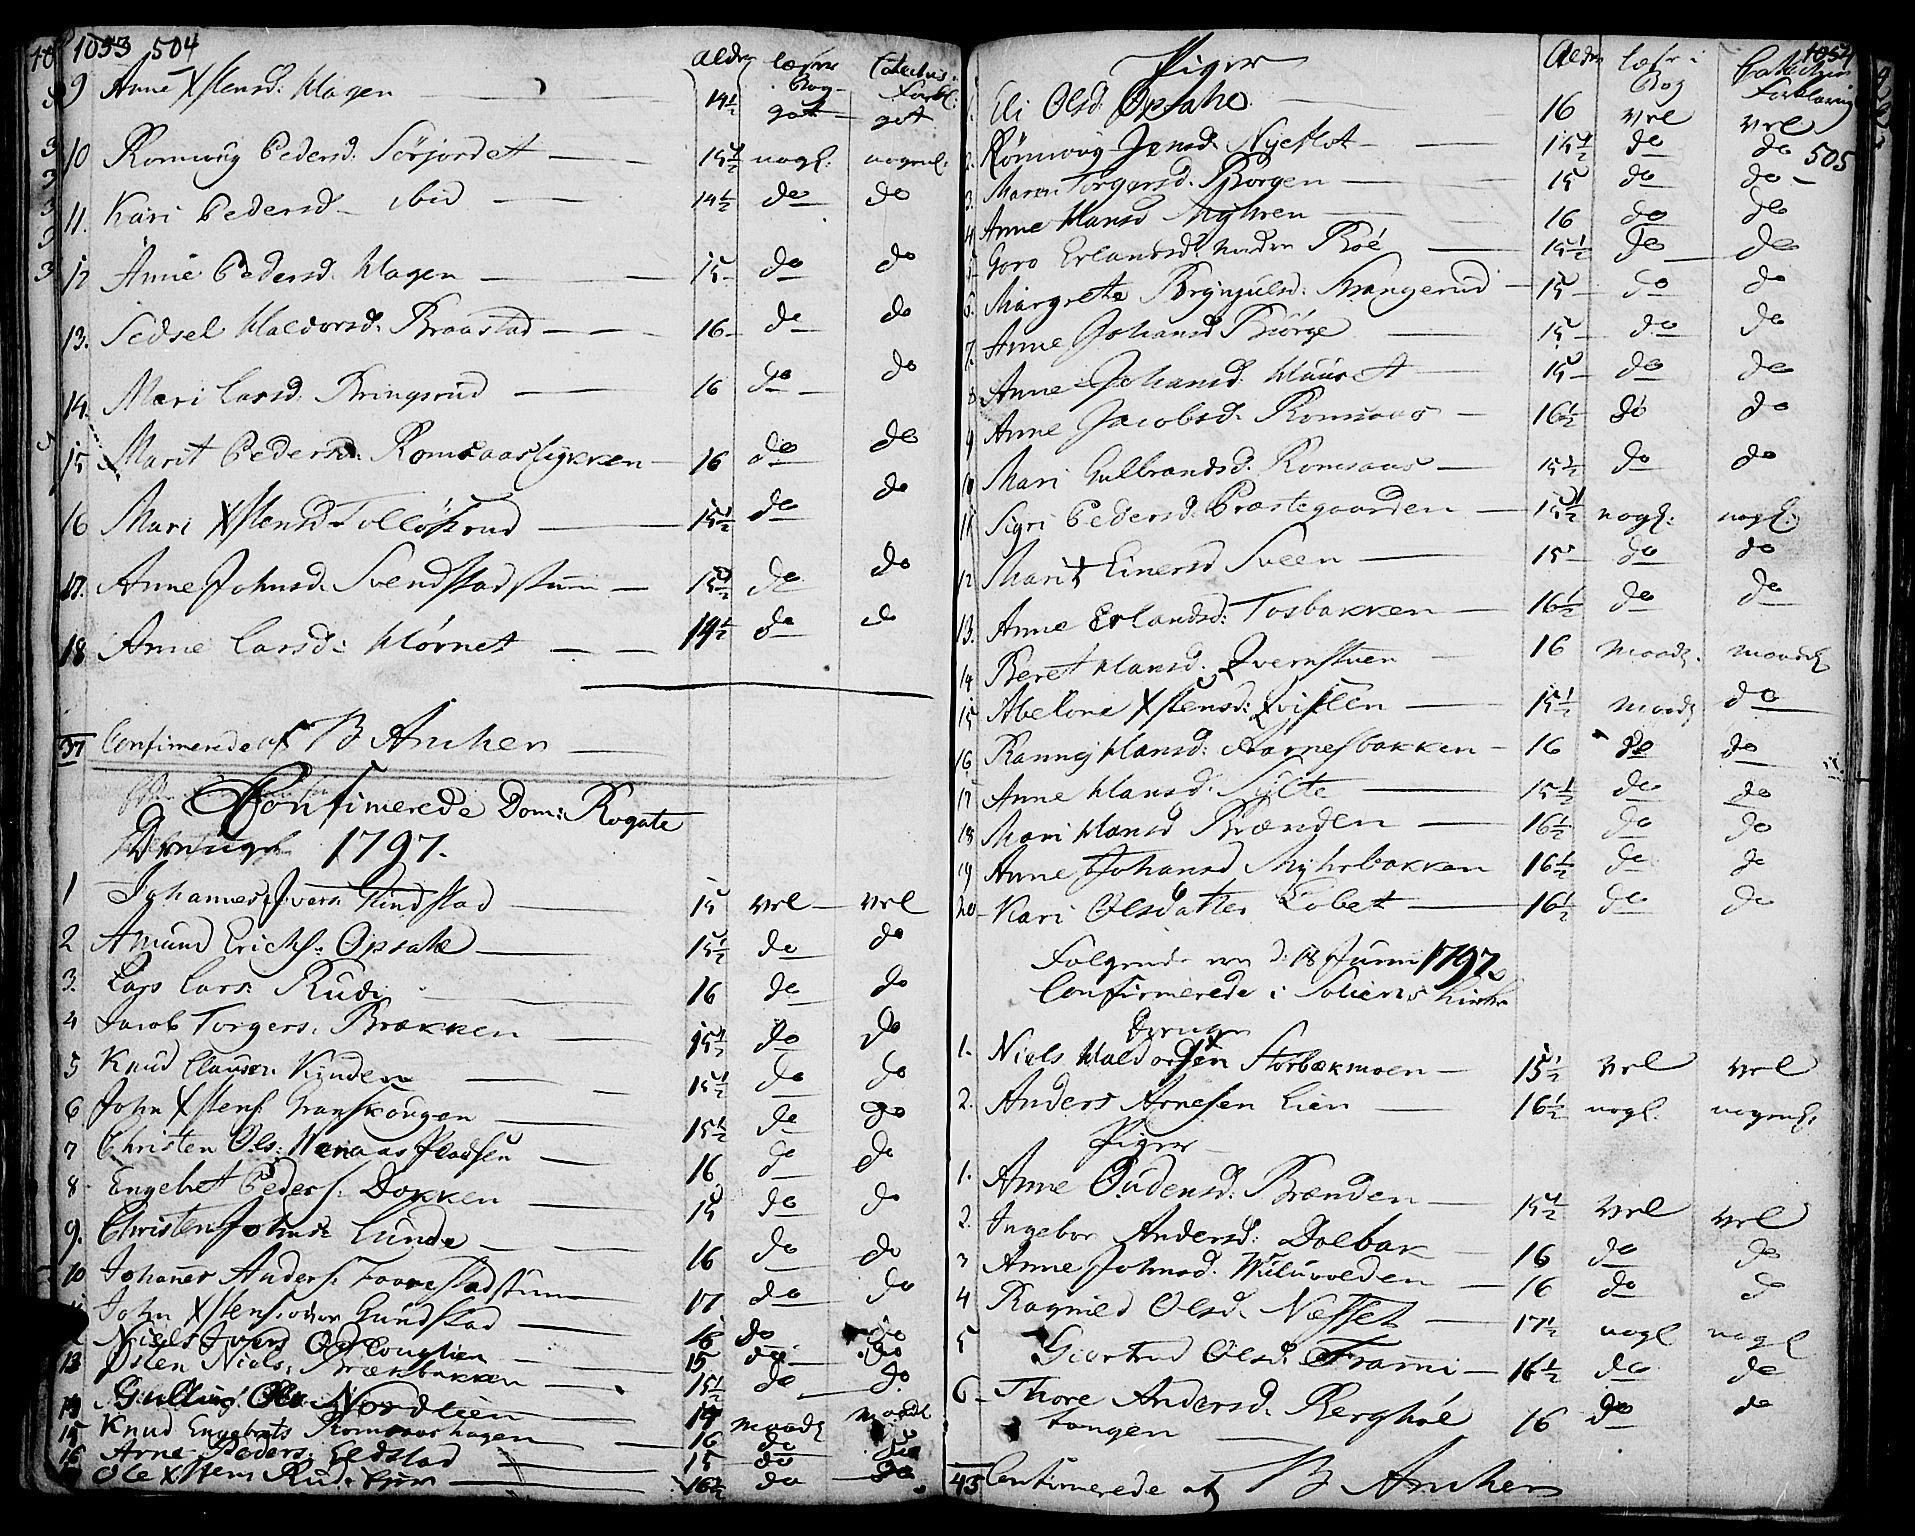 SAH, Ringebu prestekontor, Ministerialbok nr. 3, 1781-1820, s. 504-505